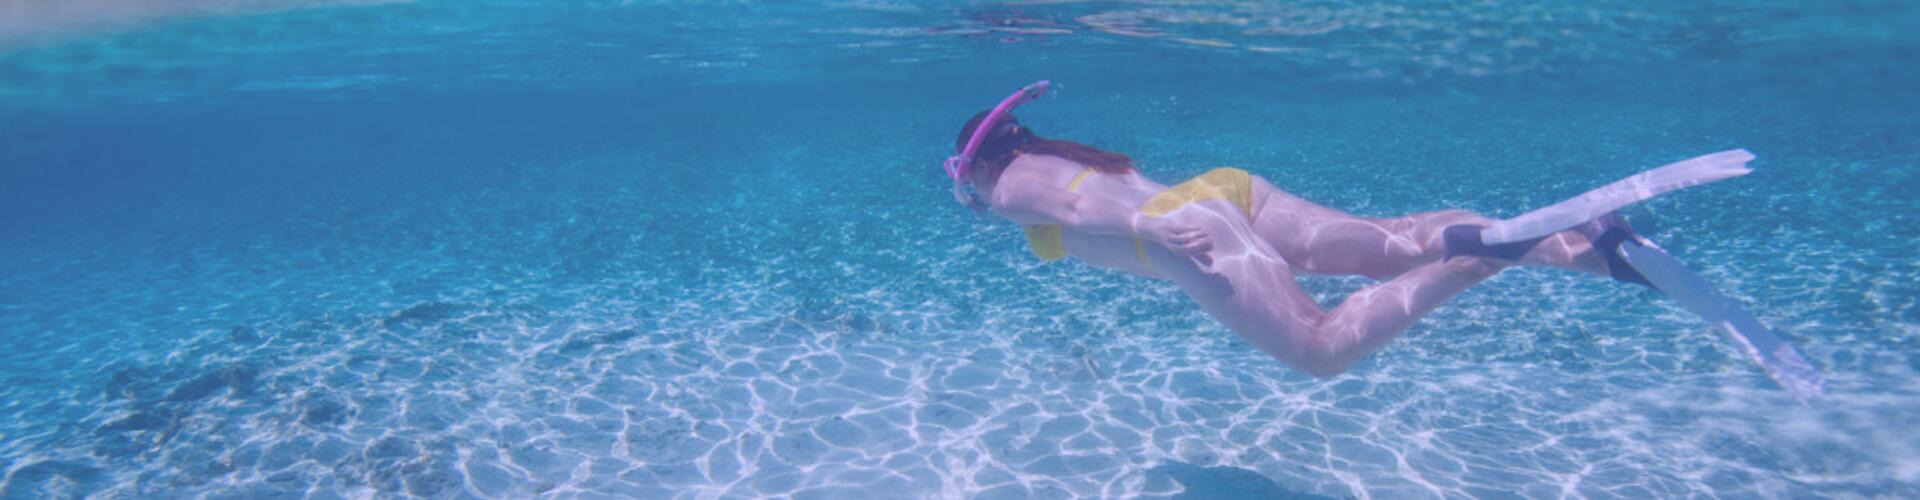 Snorkel Key West, FL